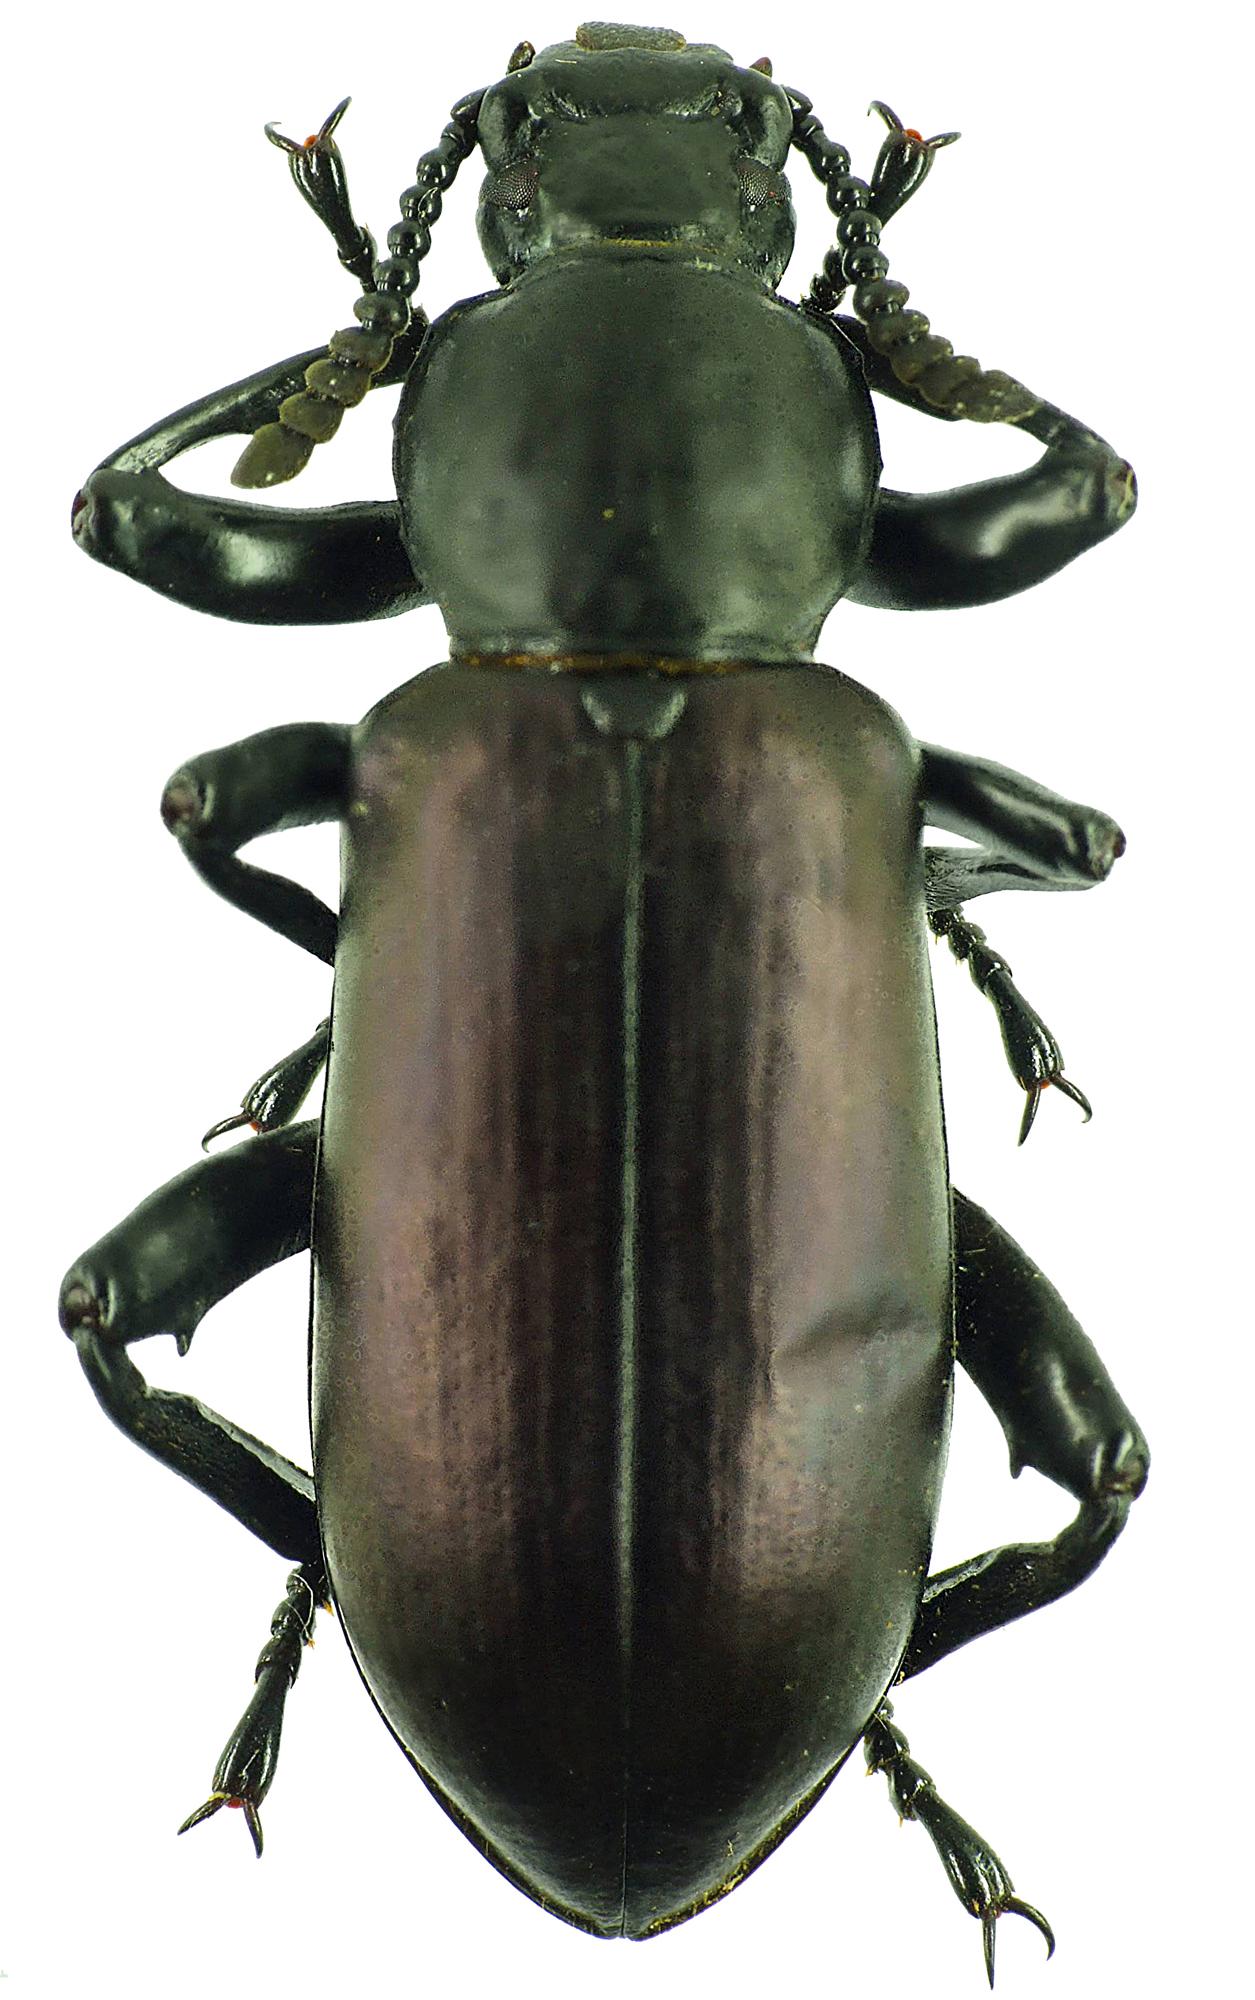 Calostegia purpuripennis 23739cz45.jpg